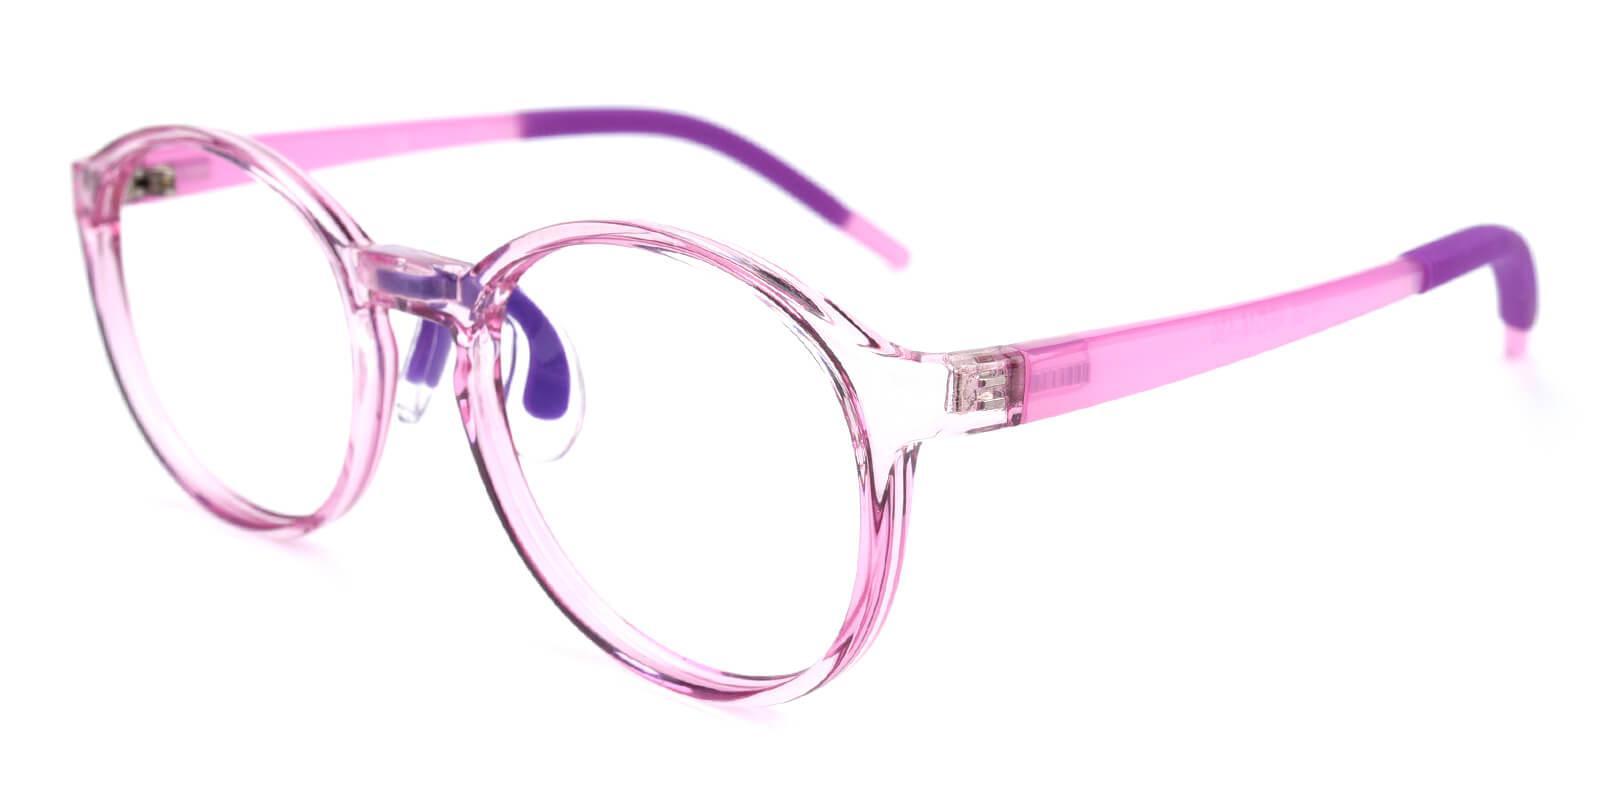 Chigor-Purple-Round-TR-Eyeglasses-additional1